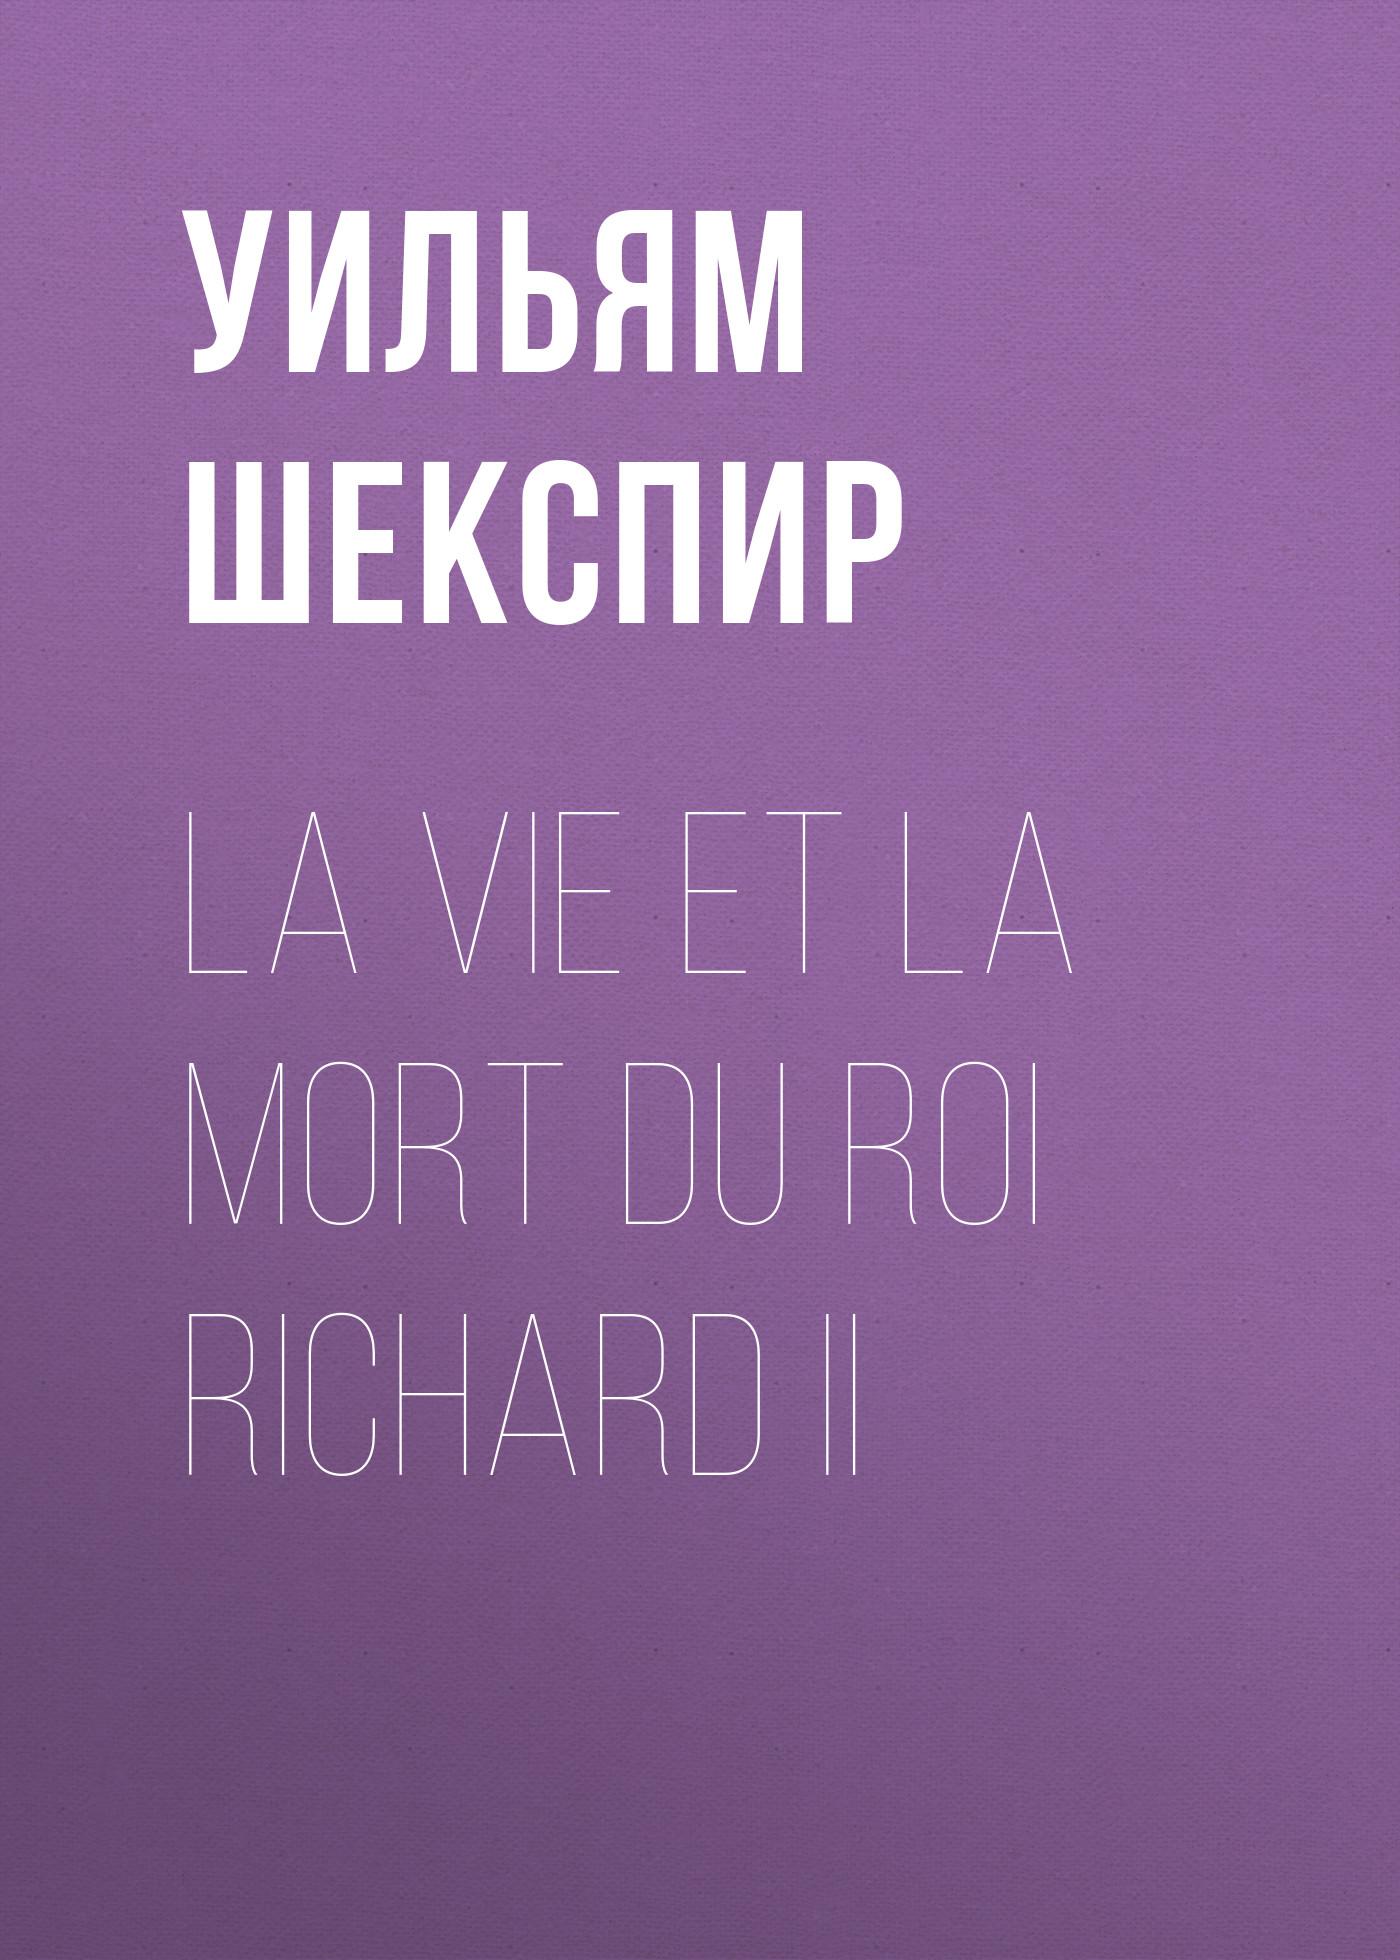 Уильям Шекспир La vie et la mort du roi Richard II уильям шекспир richard iii